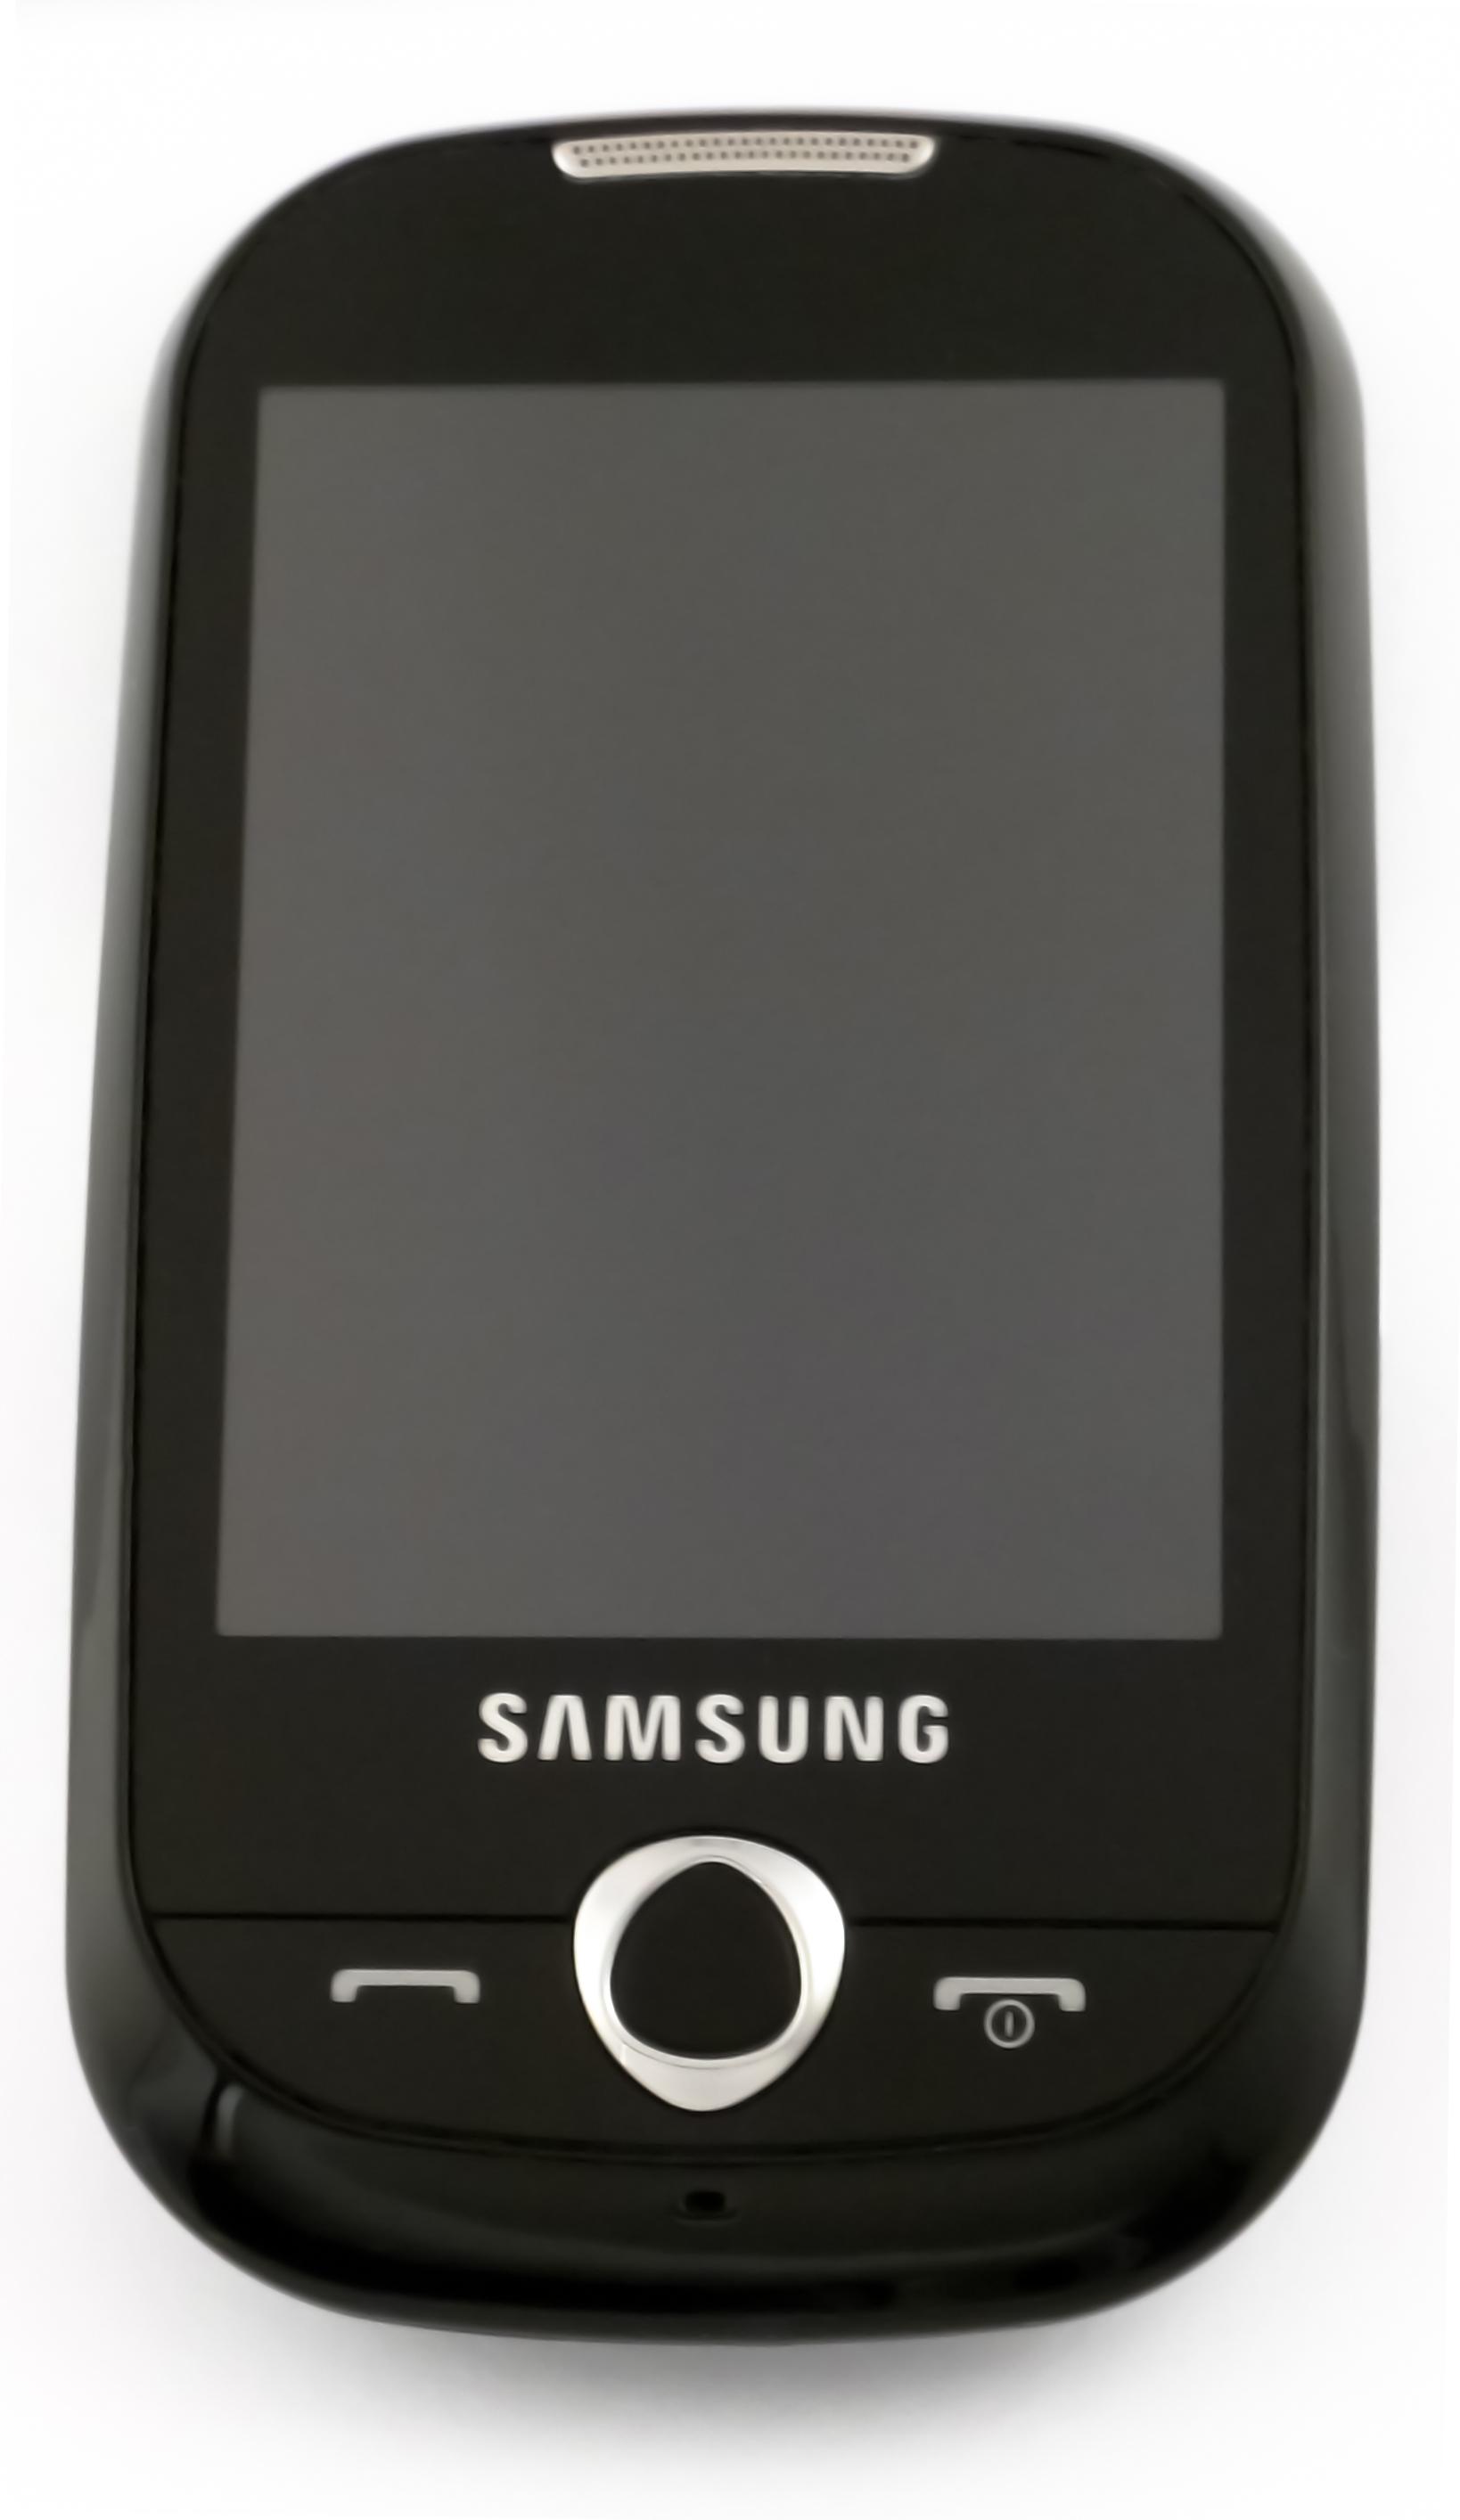 File:Samsung-corby.jpg - Wikimedia Commons